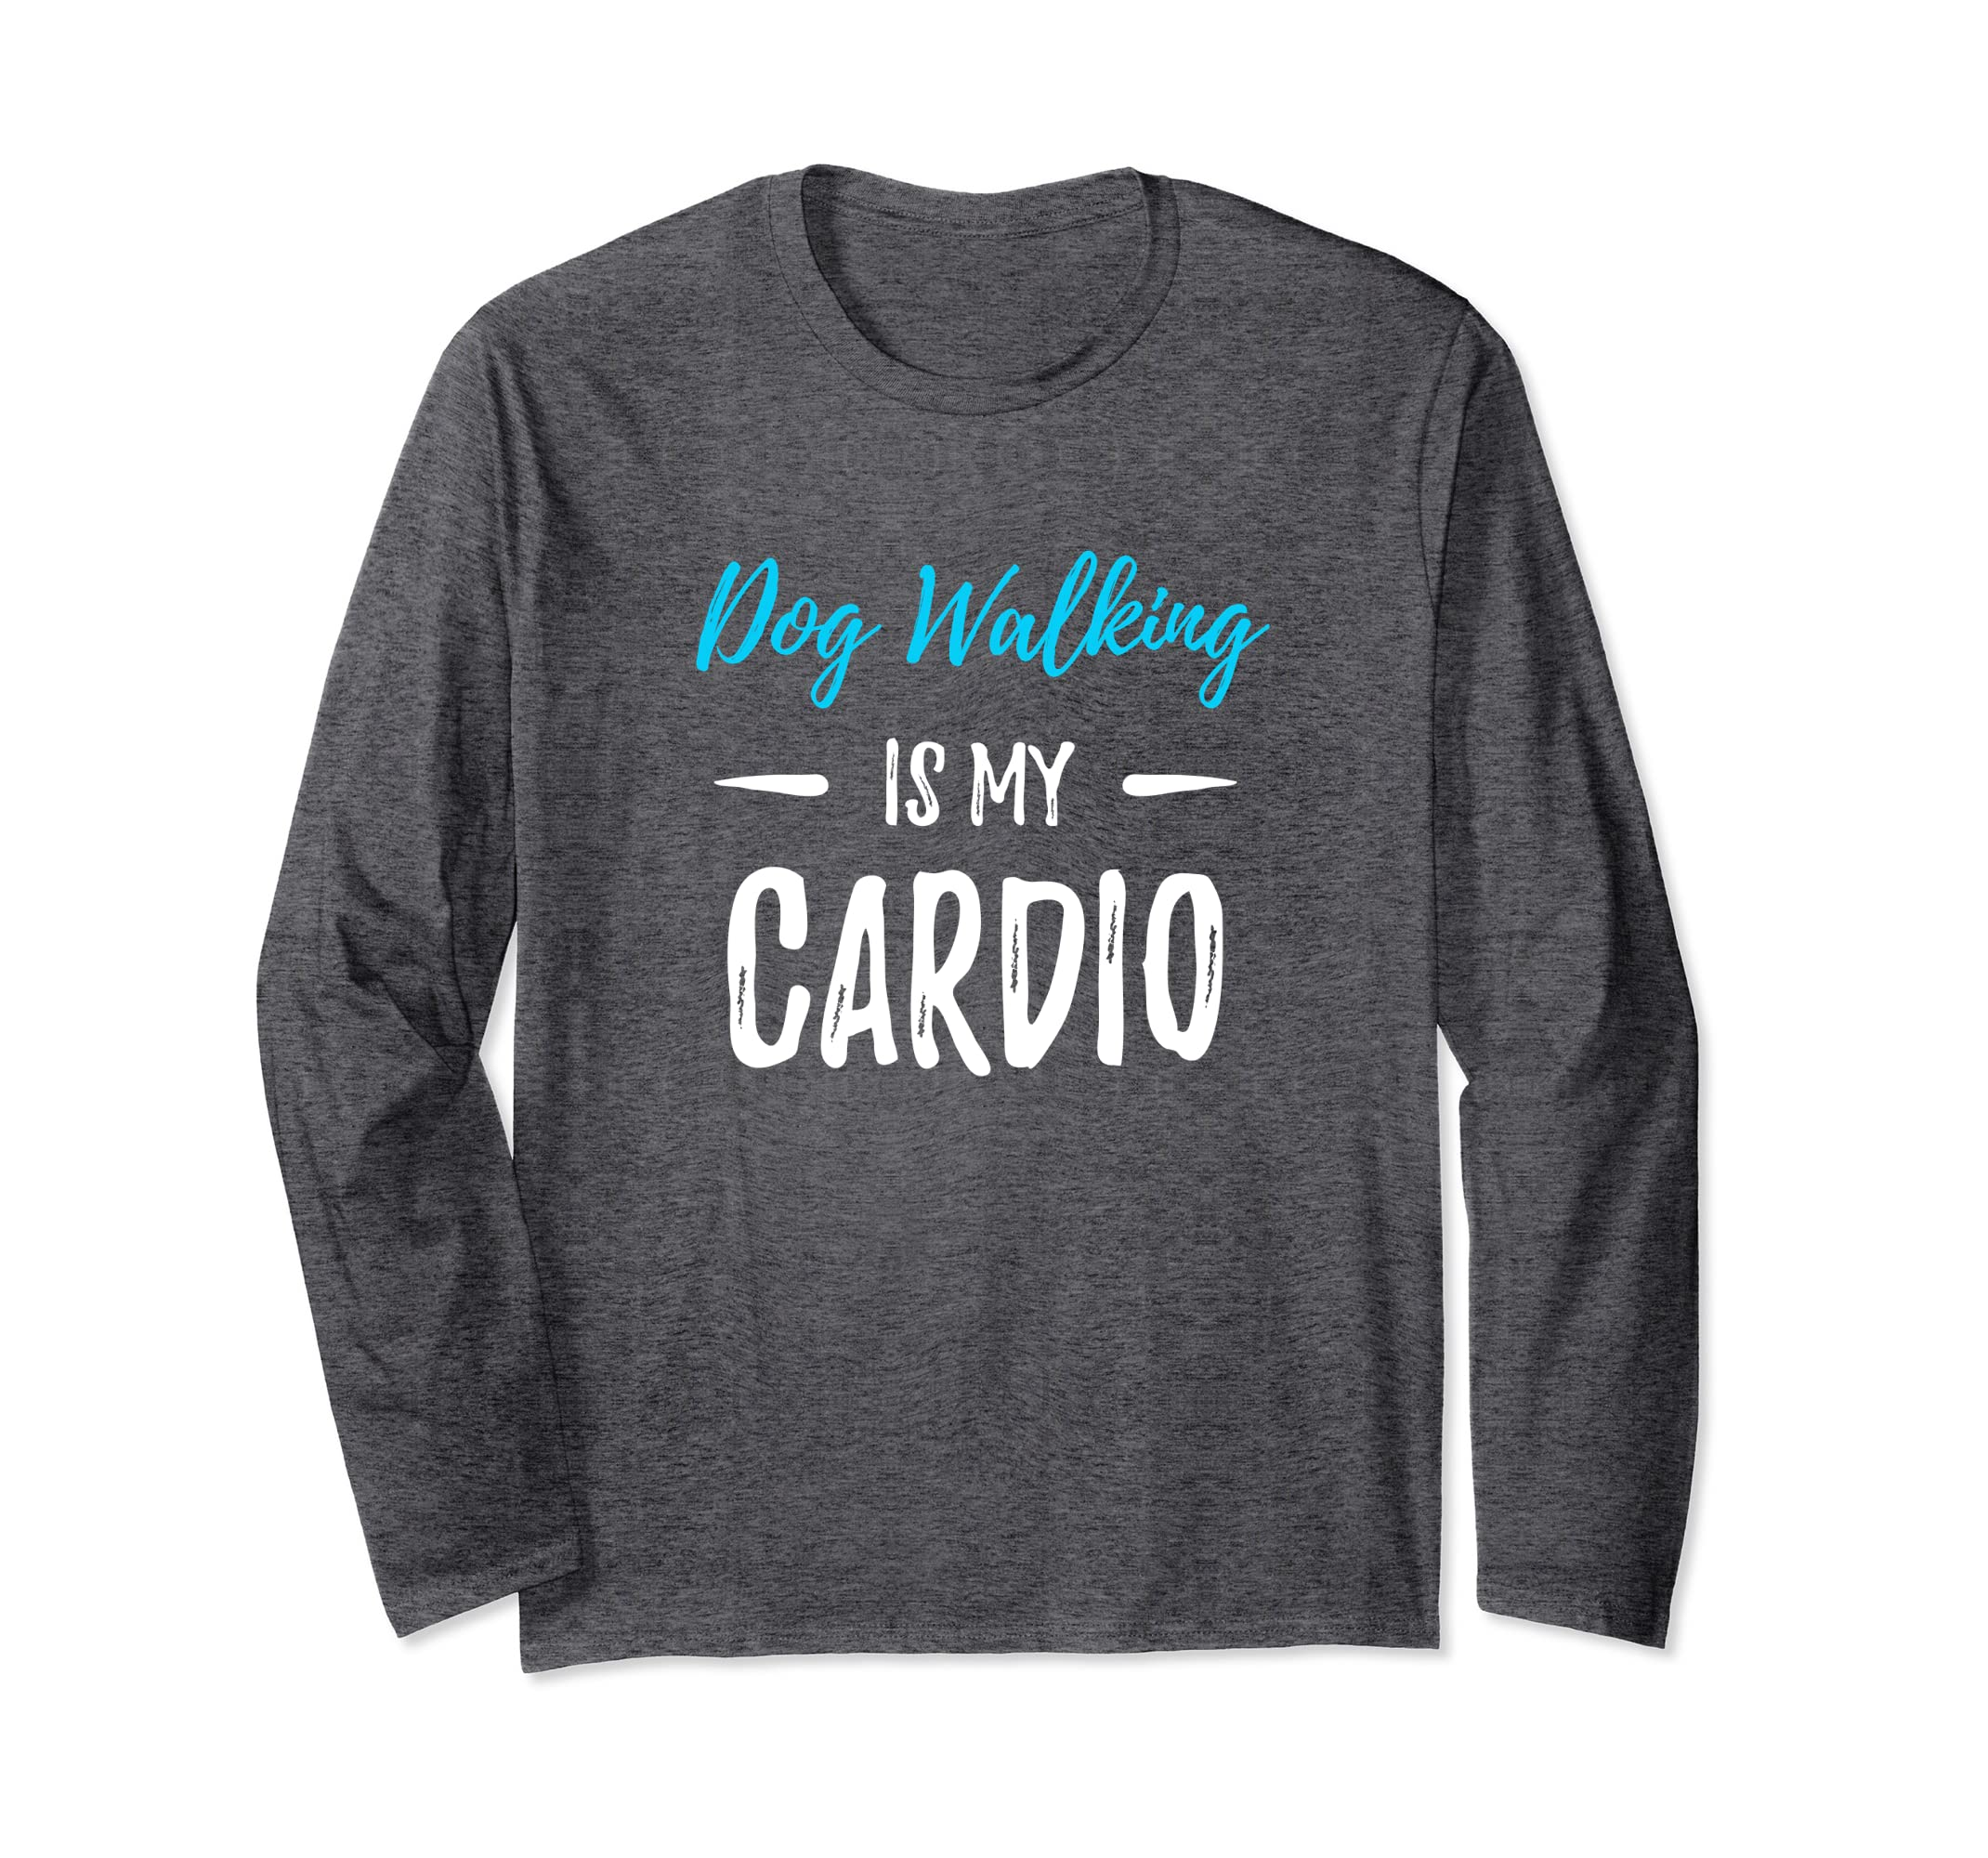 Dog Walking Cardio Long Sleeve Shirt Funny Dog Lover Gift-Bawle